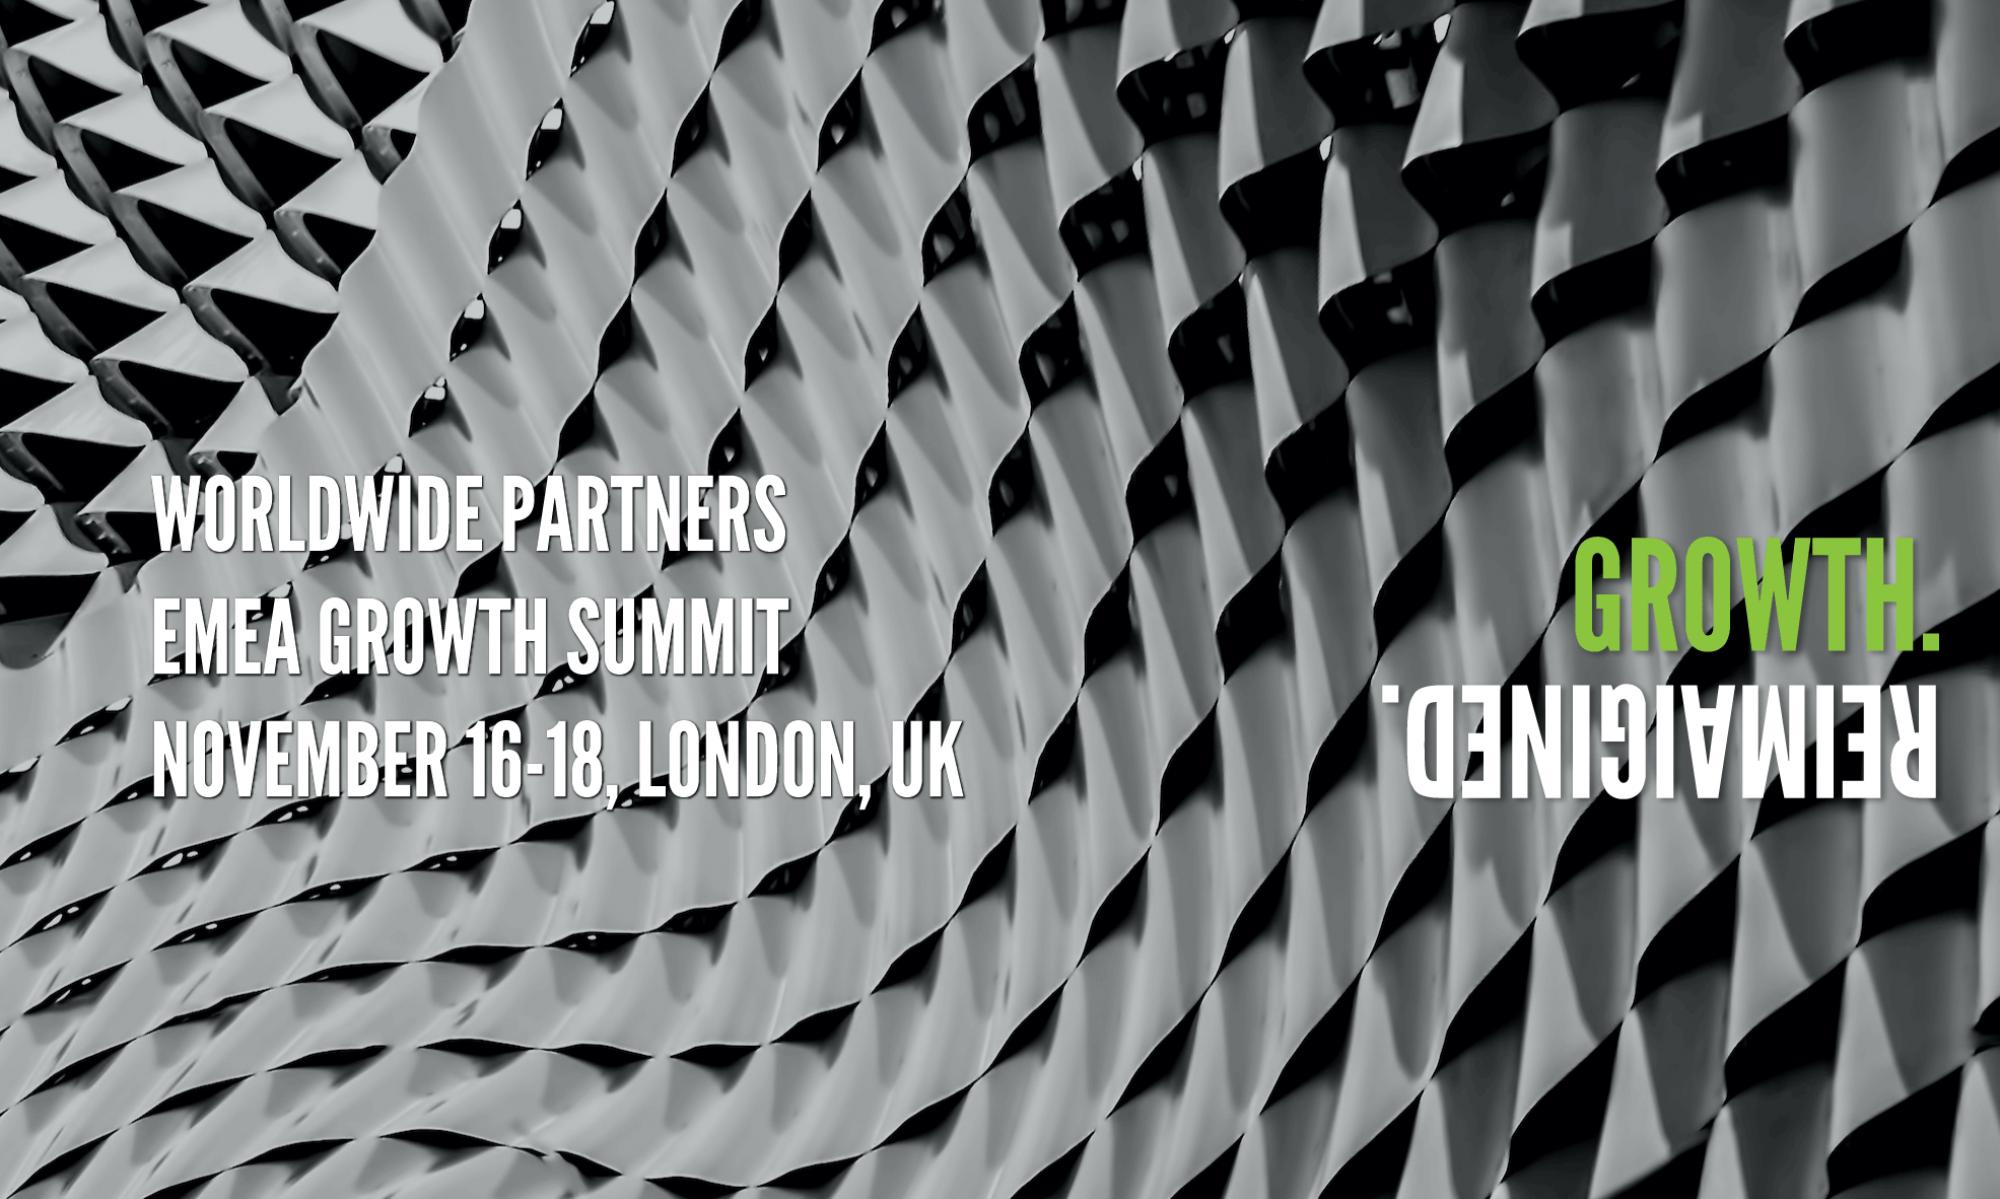 Worldwide Partners Growth Summit